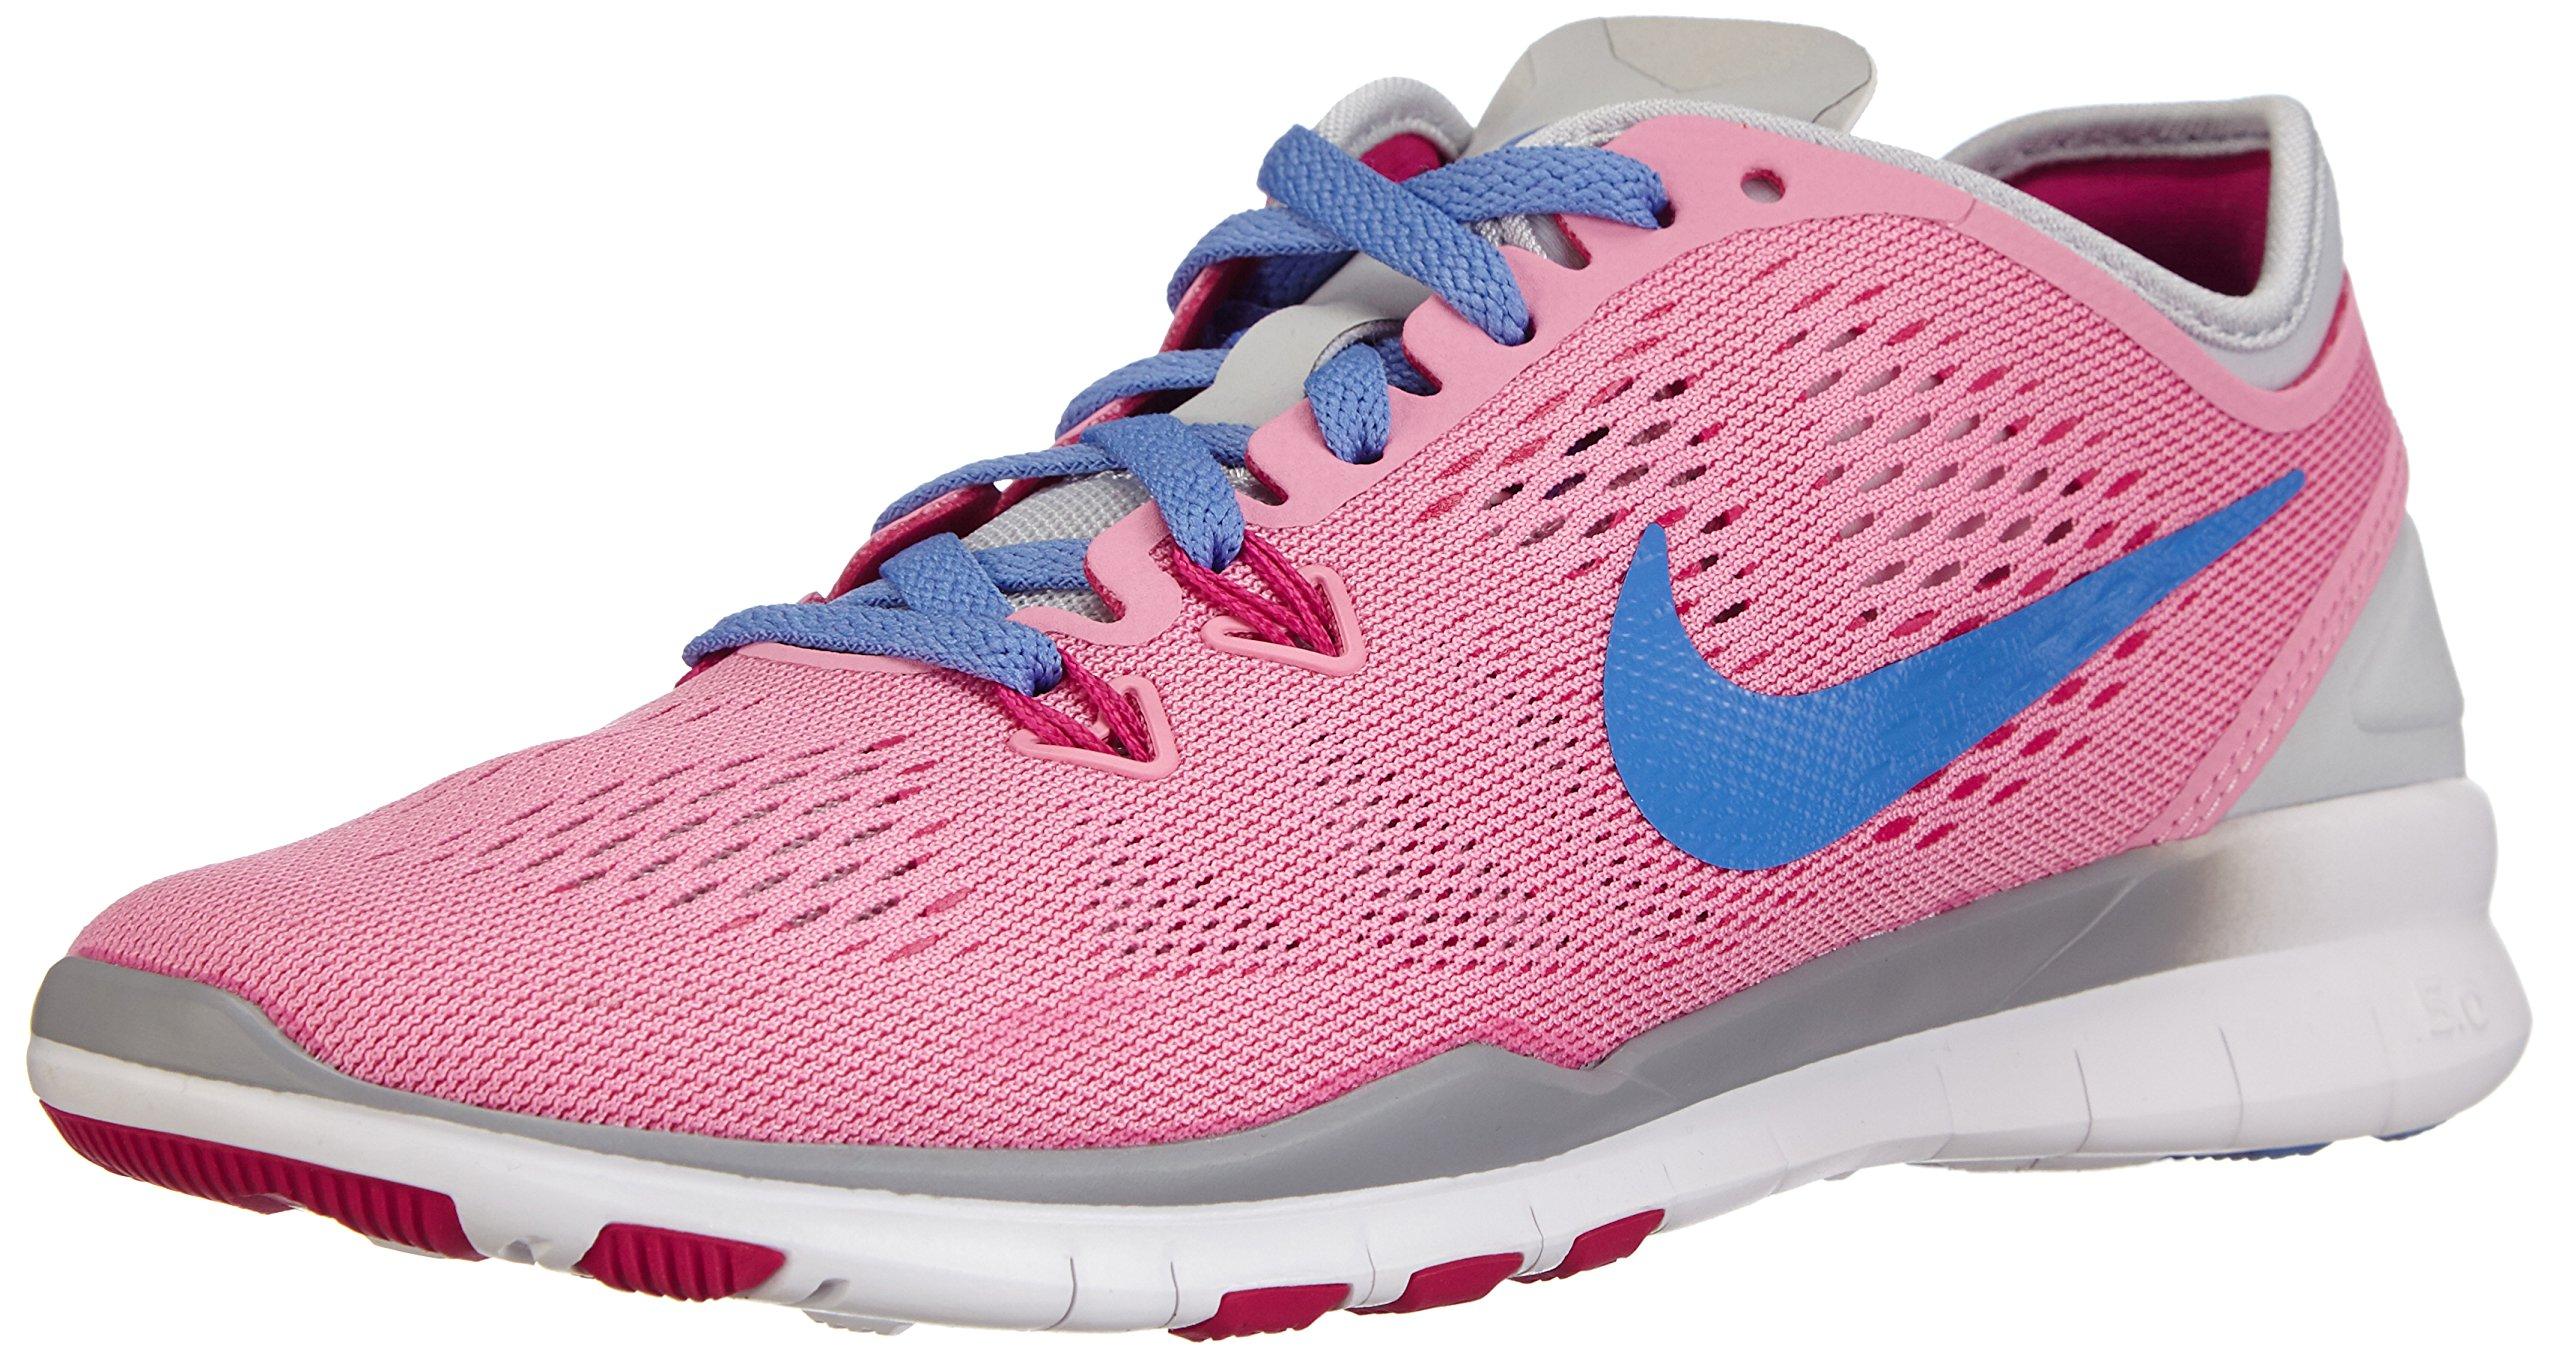 Nike Women's Free 5.0 TR Fit 5 Rose/Polar/PR Platinum/Frbrry Training Shoe 6.5 Women US